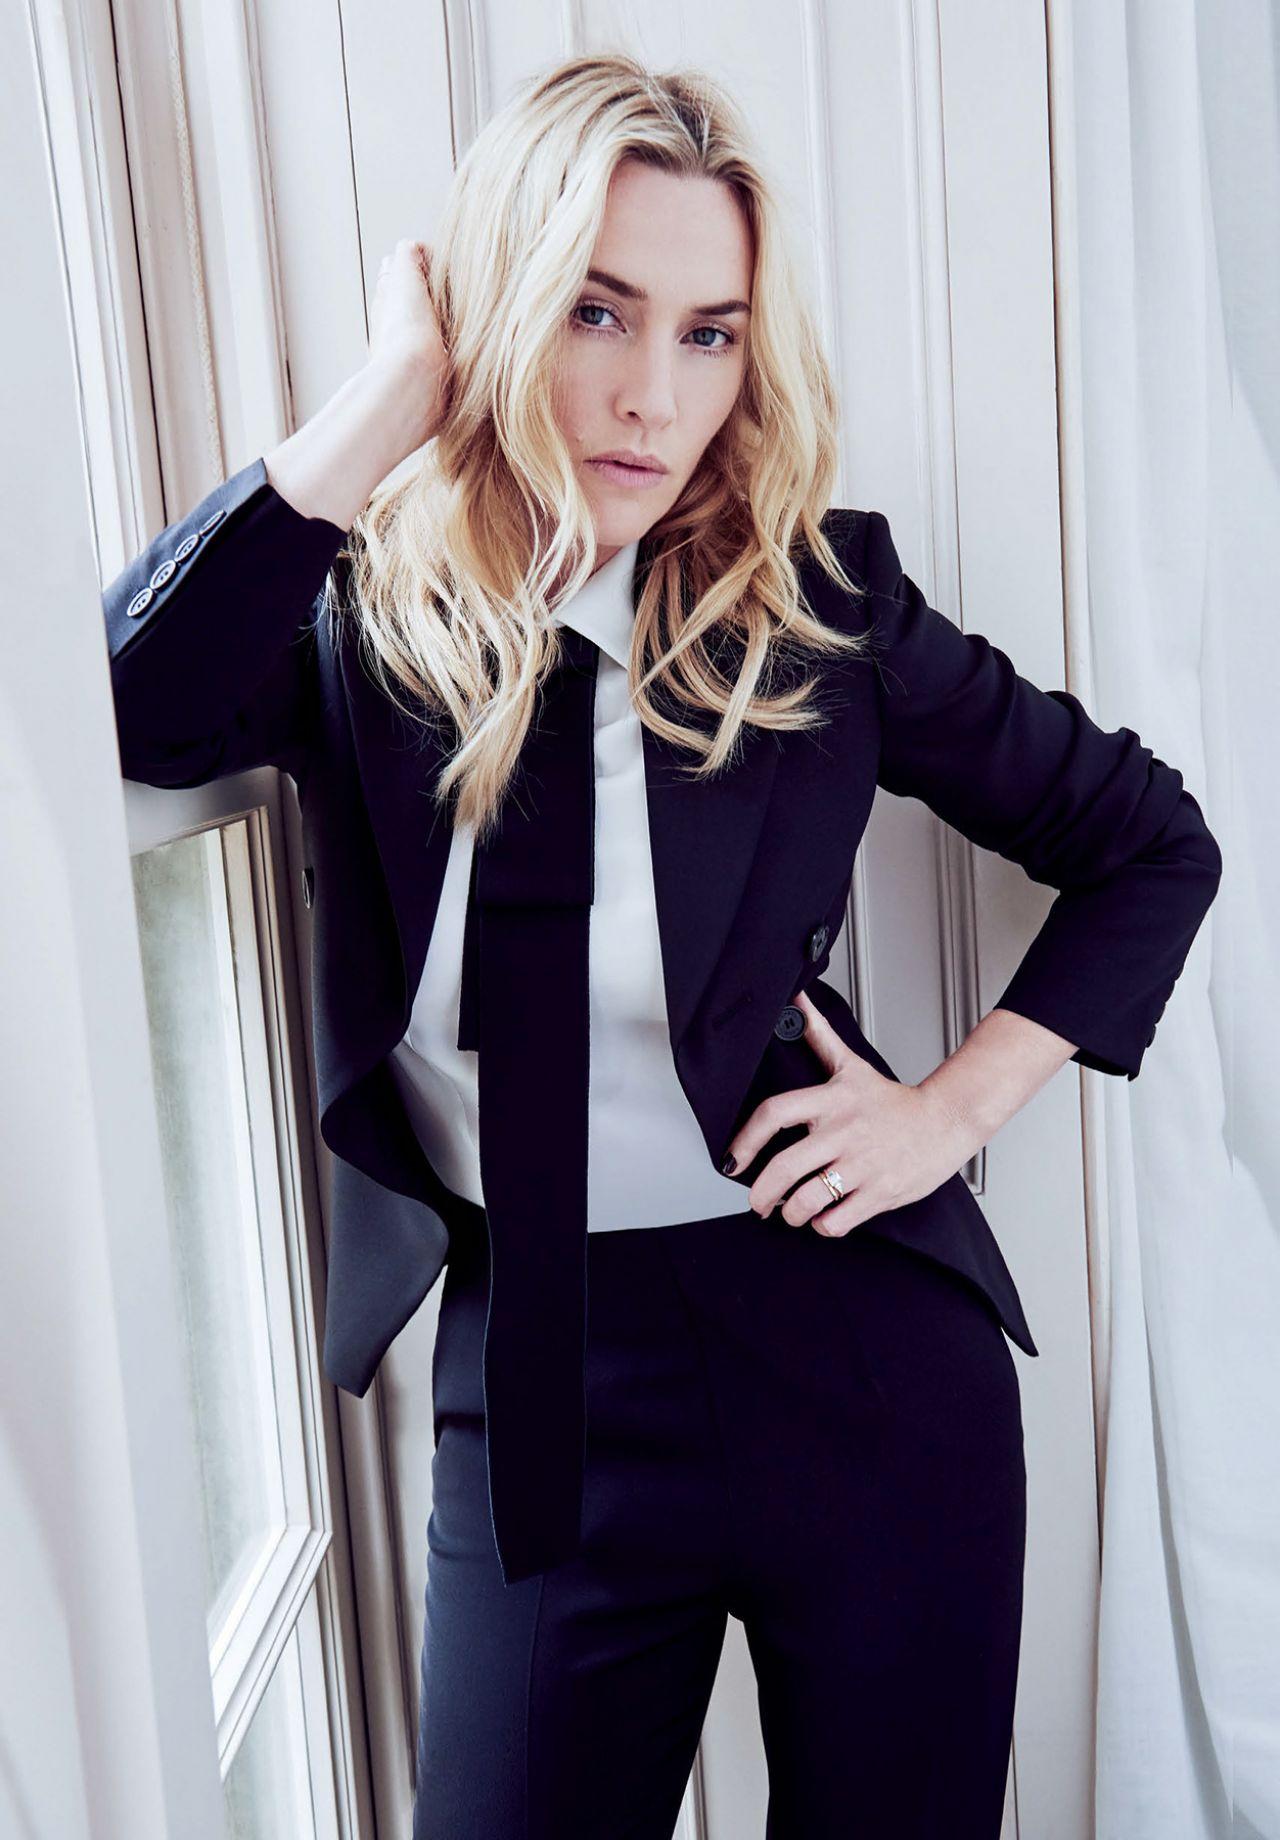 Kate Winslet - Photoshoot for Gotham Magazine November 2015 Kate Winslet